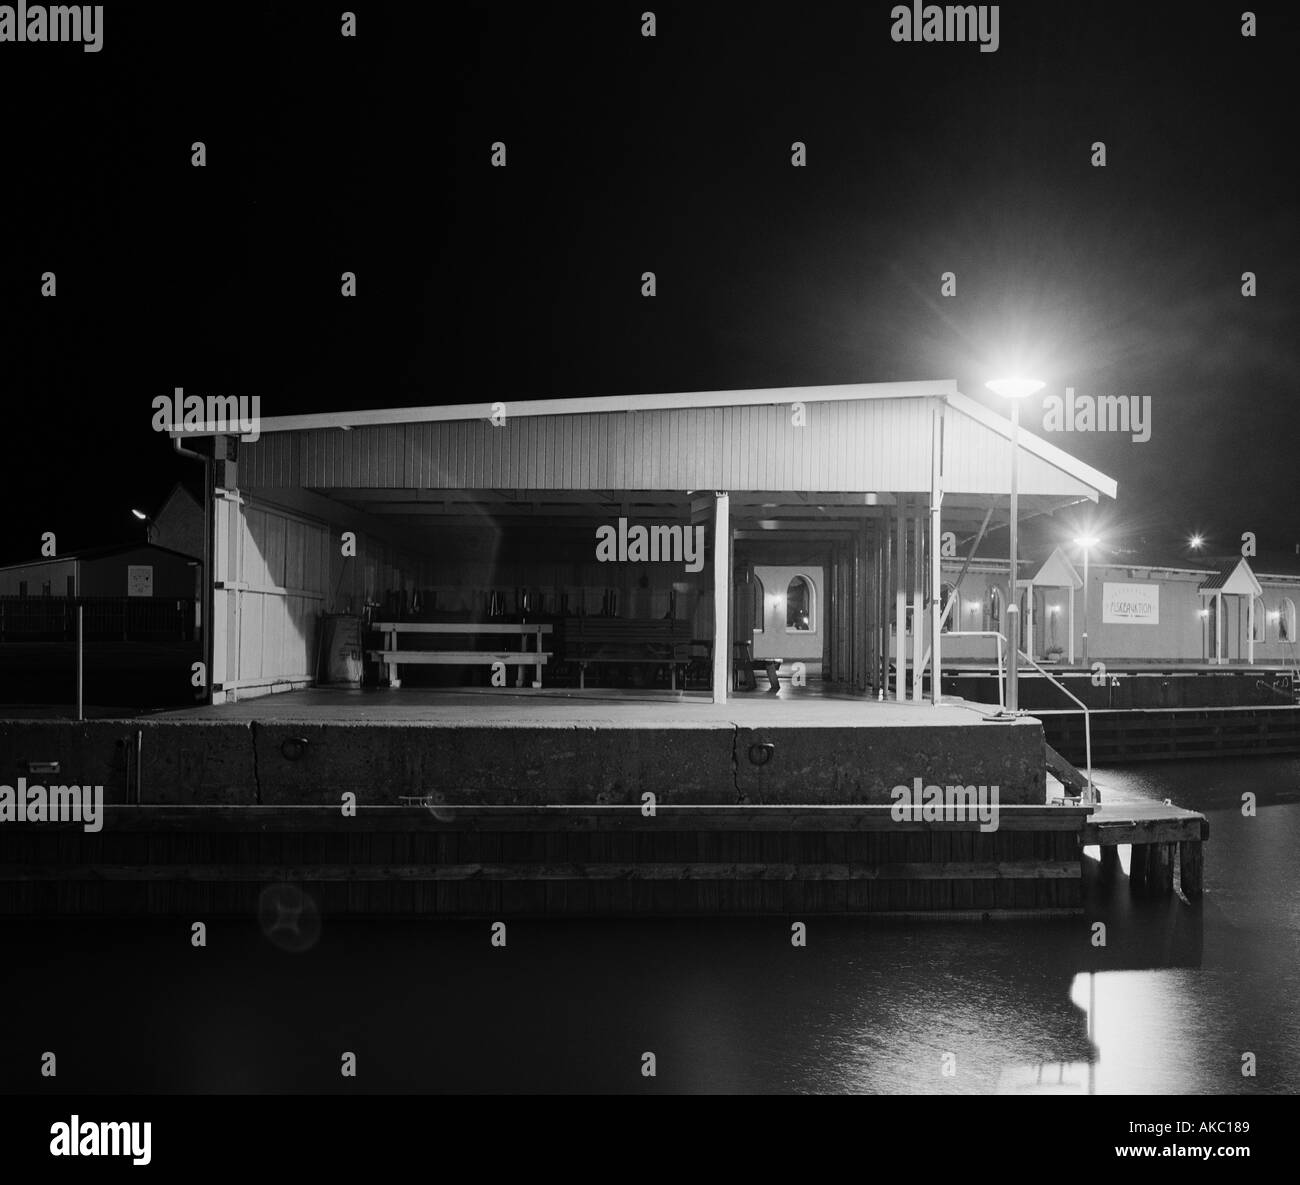 shelter in harbour at night Hundested Denmark - Stock Image